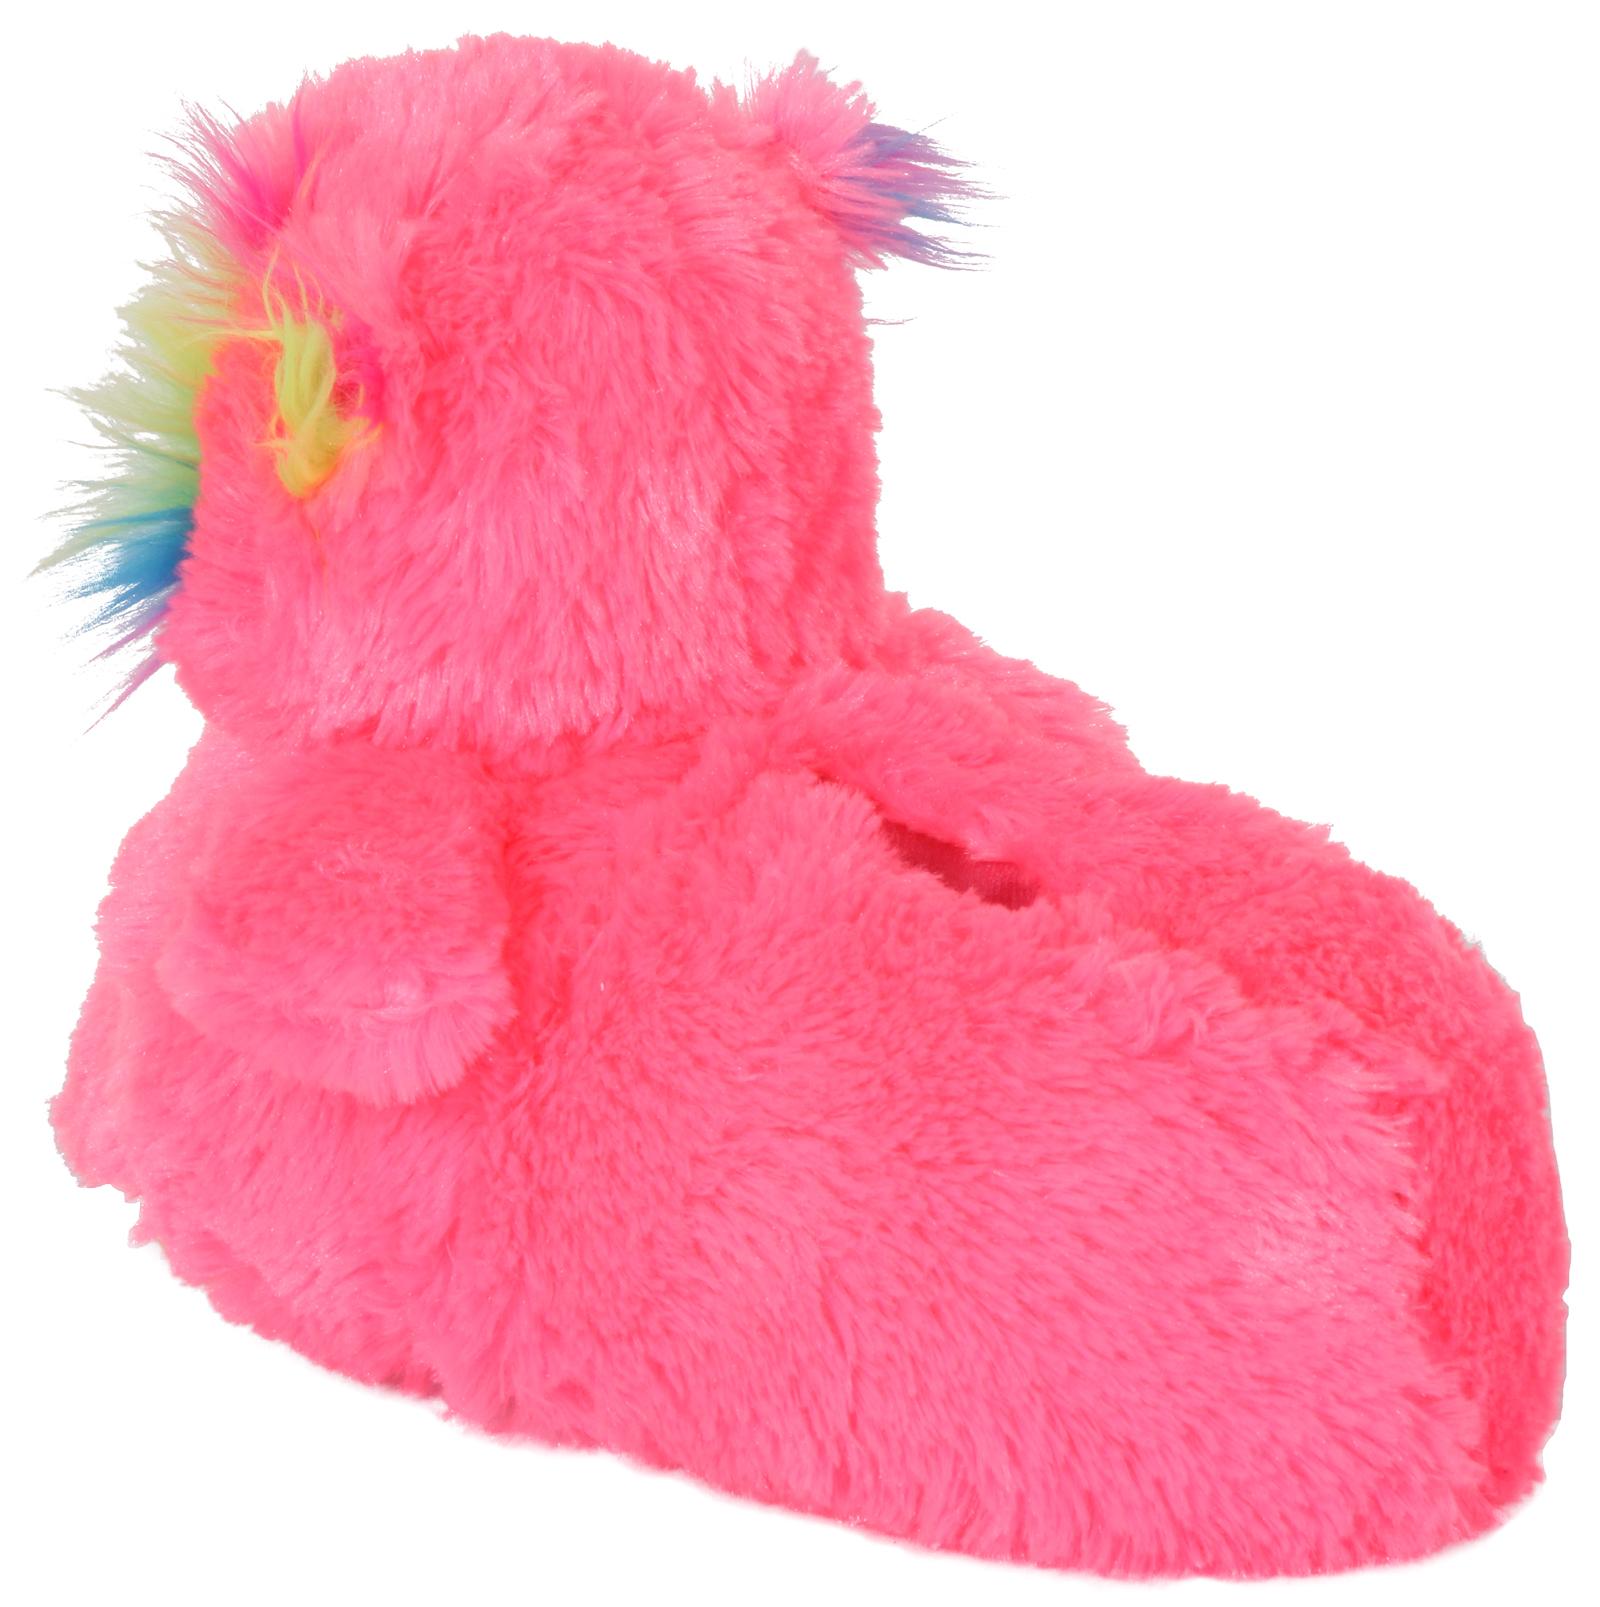 Boys Girls Kids Novelty 3D Character Plush Slippers Boots Unicorn Dino Size 9 -3